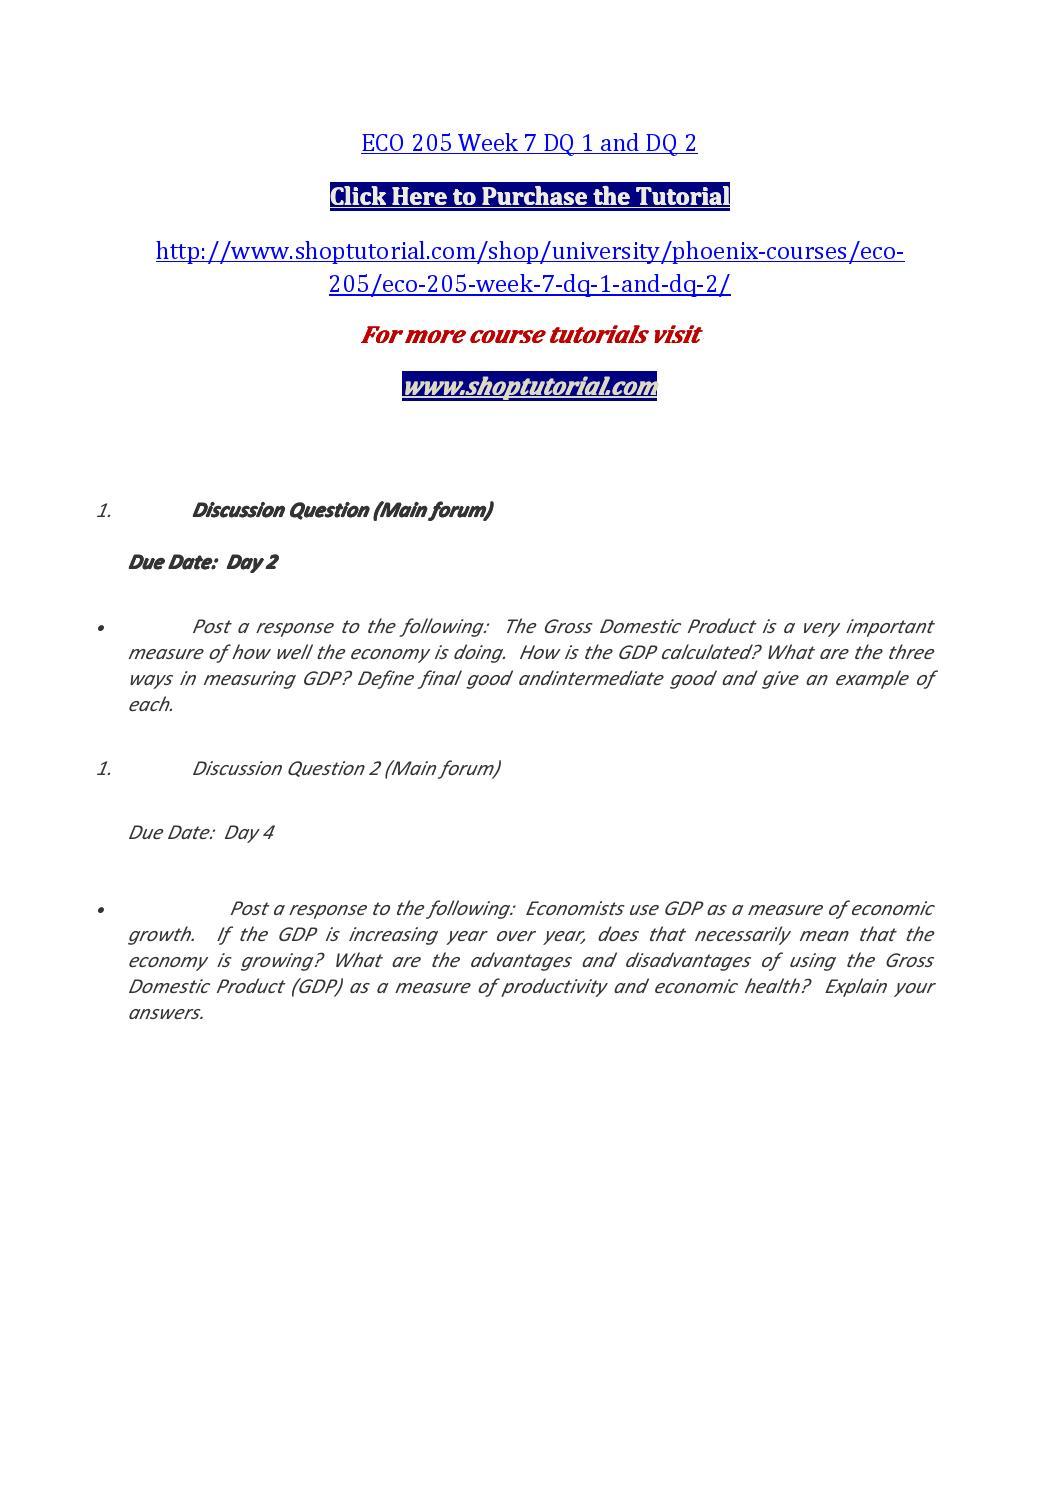 ECO 250 Homework 5 (UNCG)